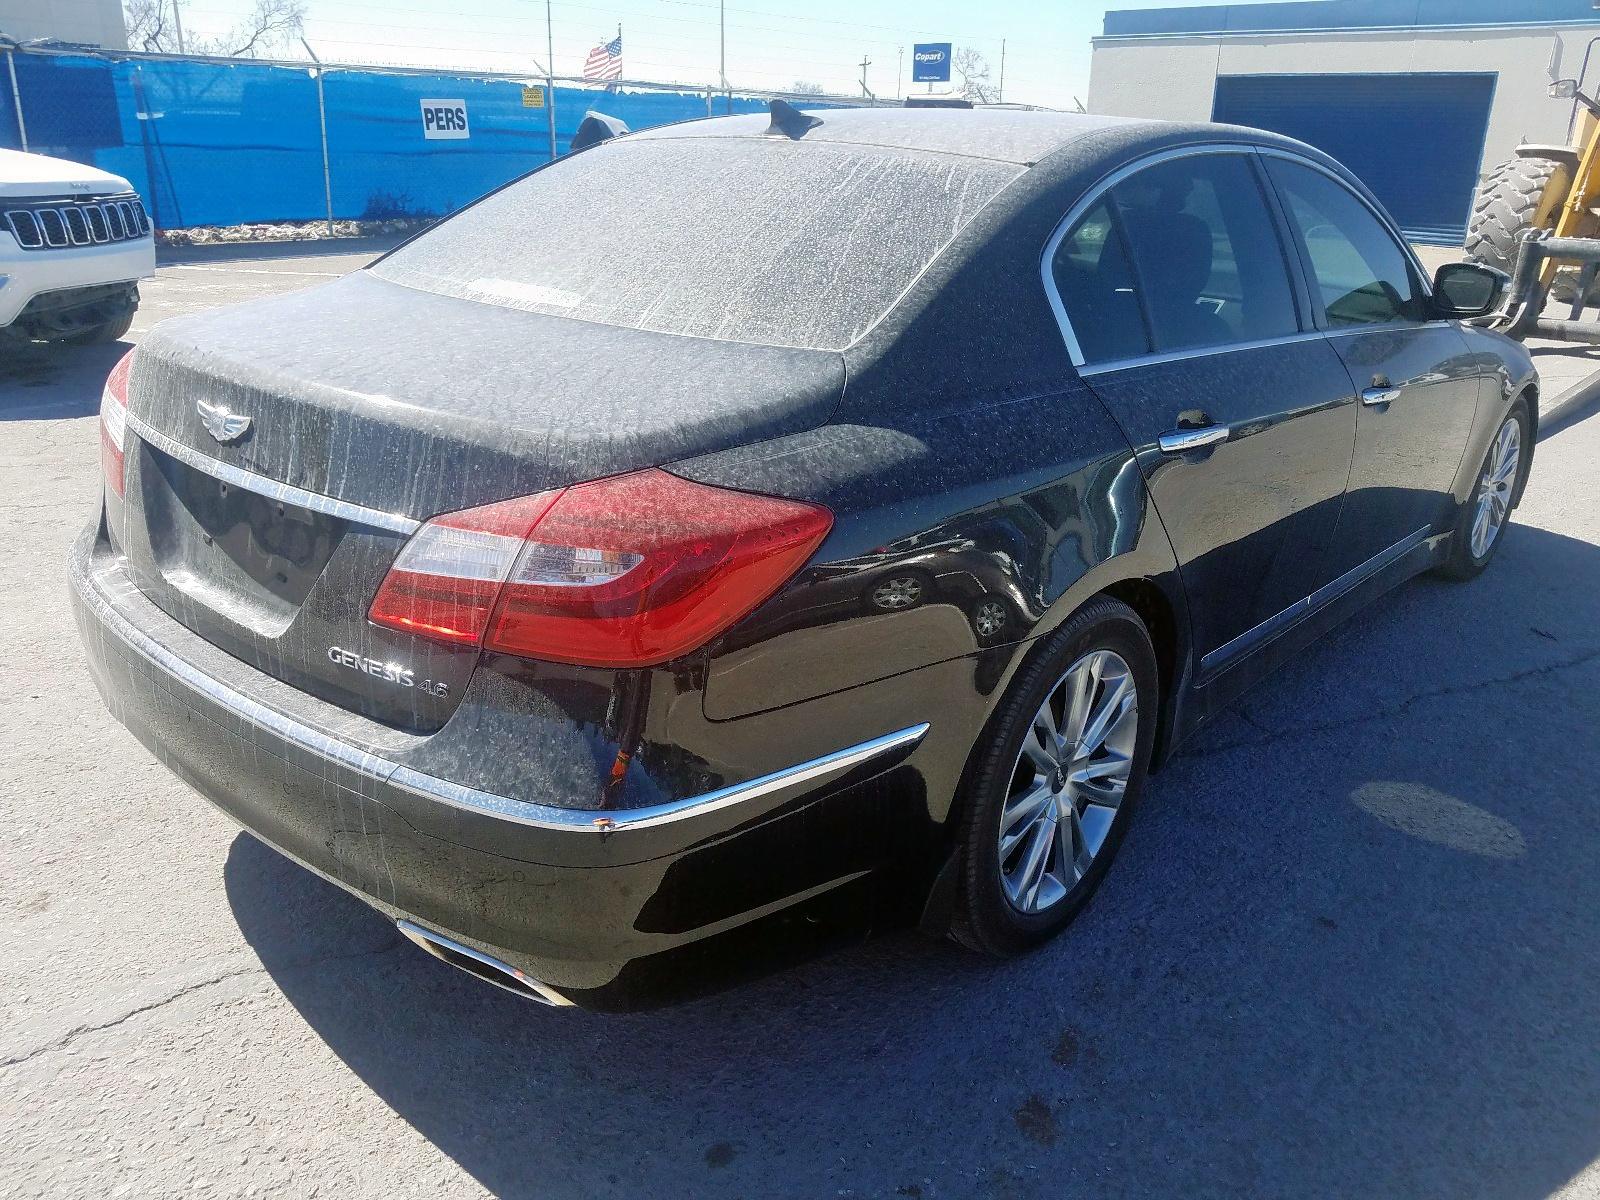 2012 Hyundai Genesis 4. 4.6L rear view